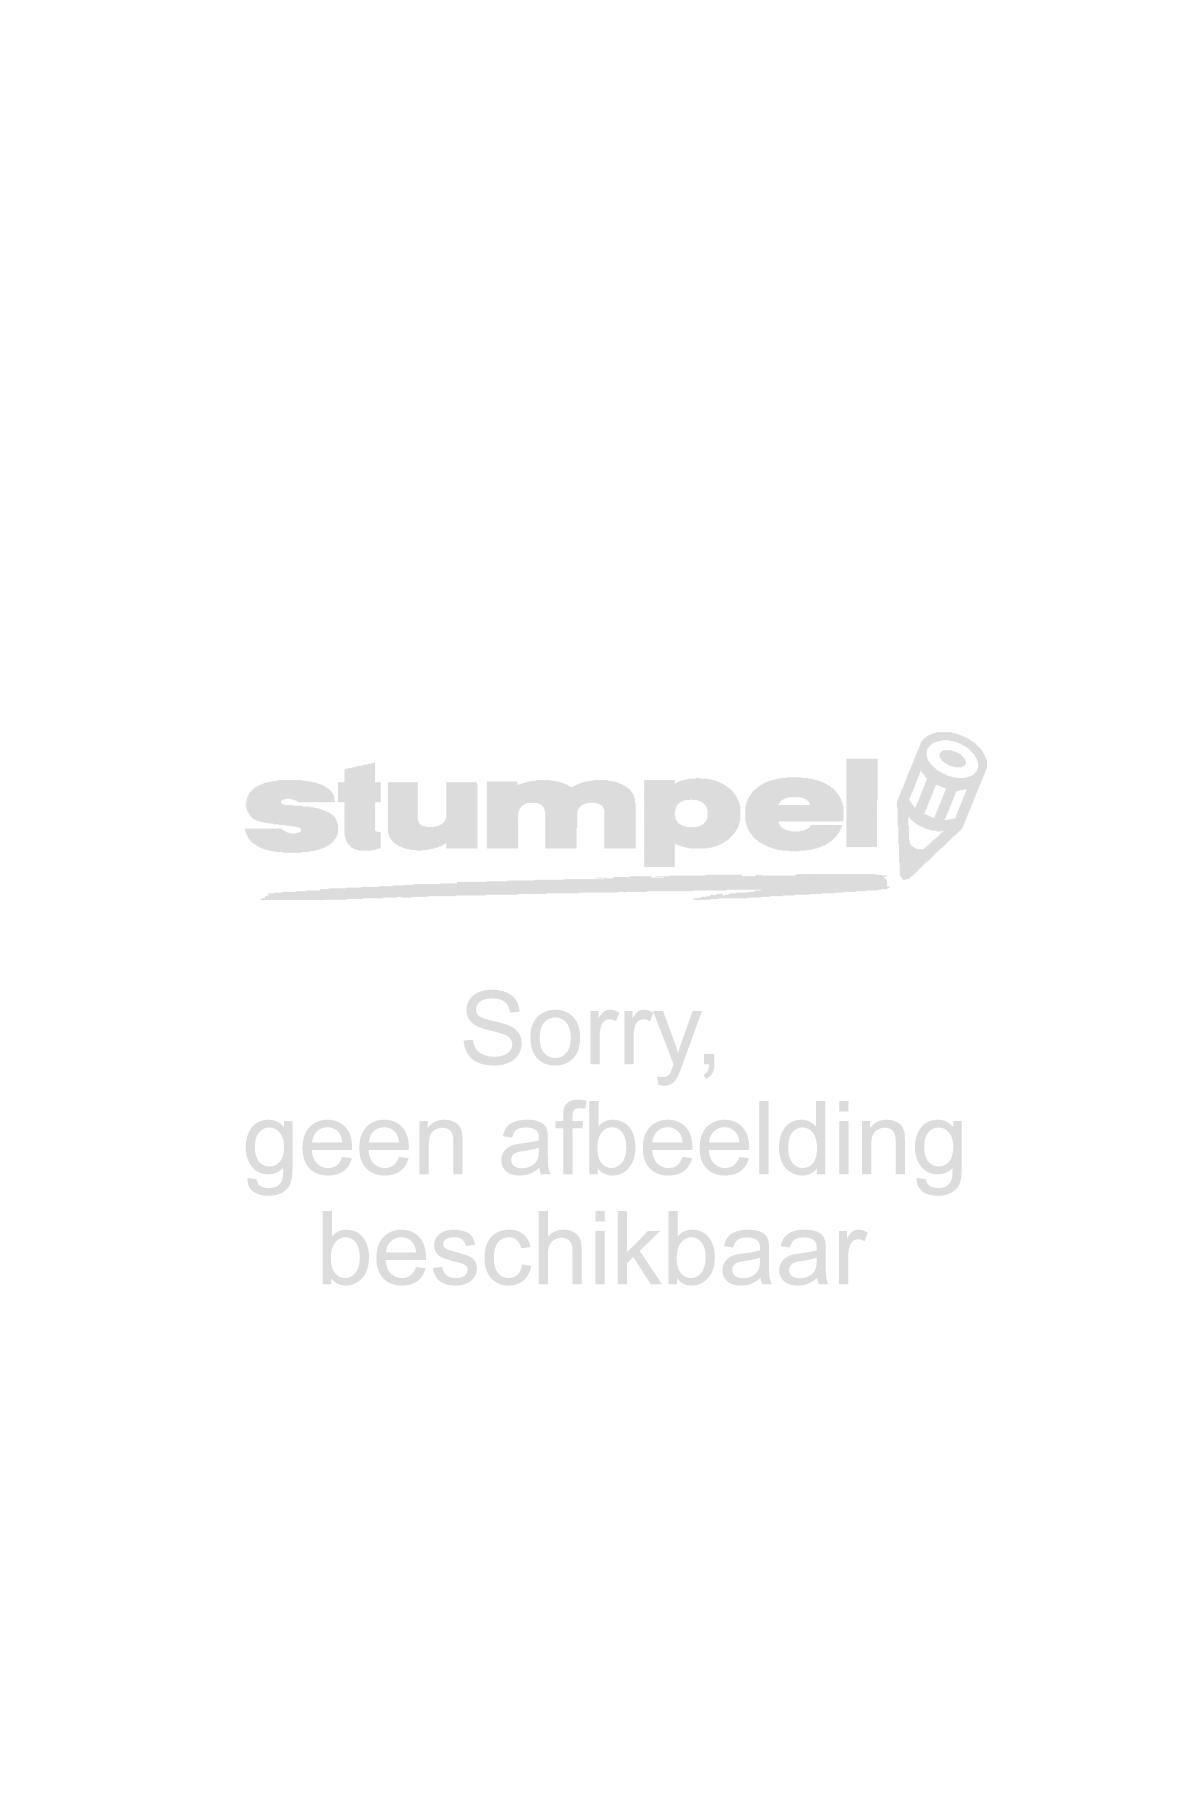 Balpen Bic Softfeel clic blauw